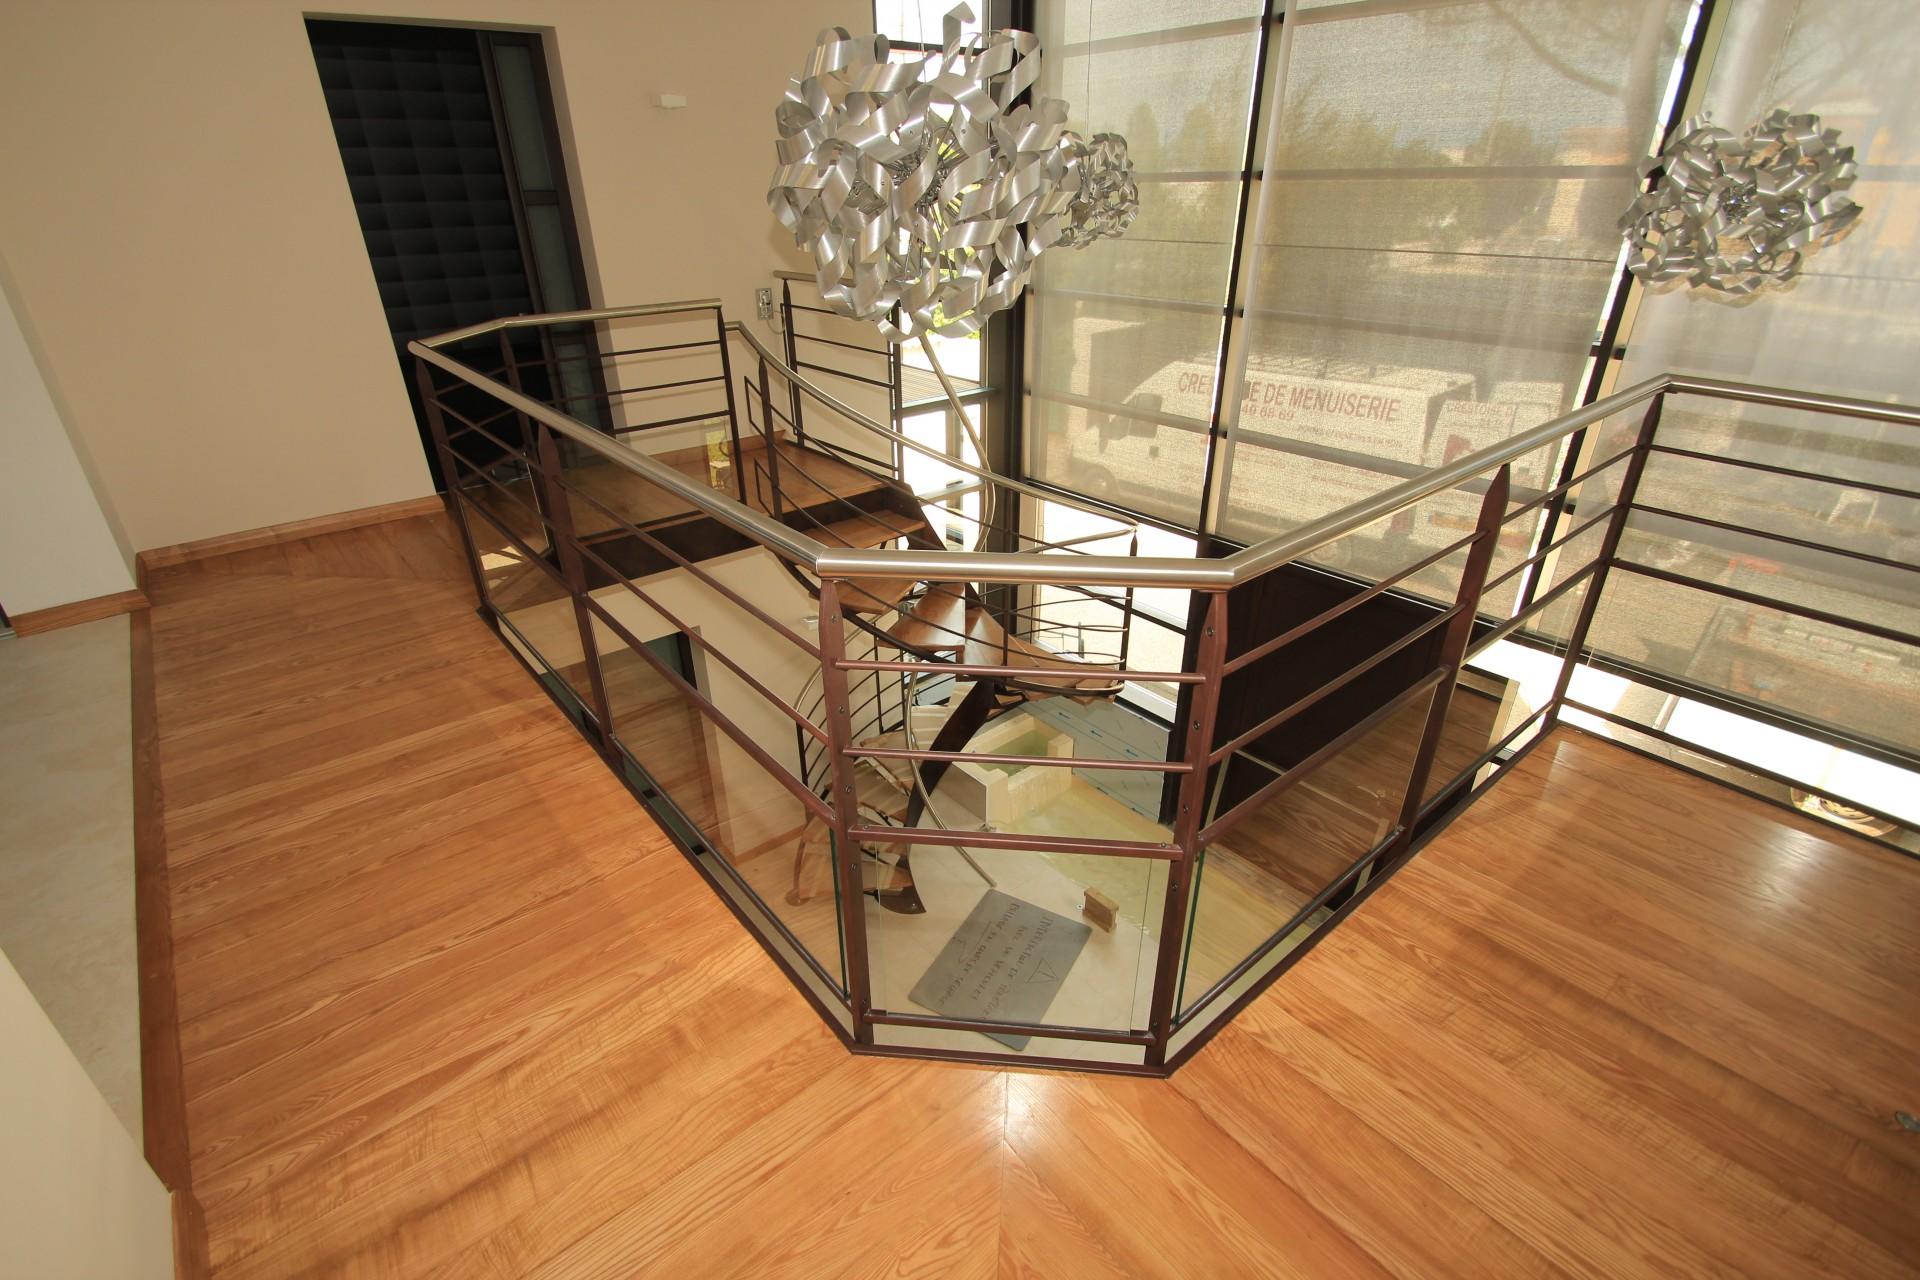 escalier menuiserie la crestoise